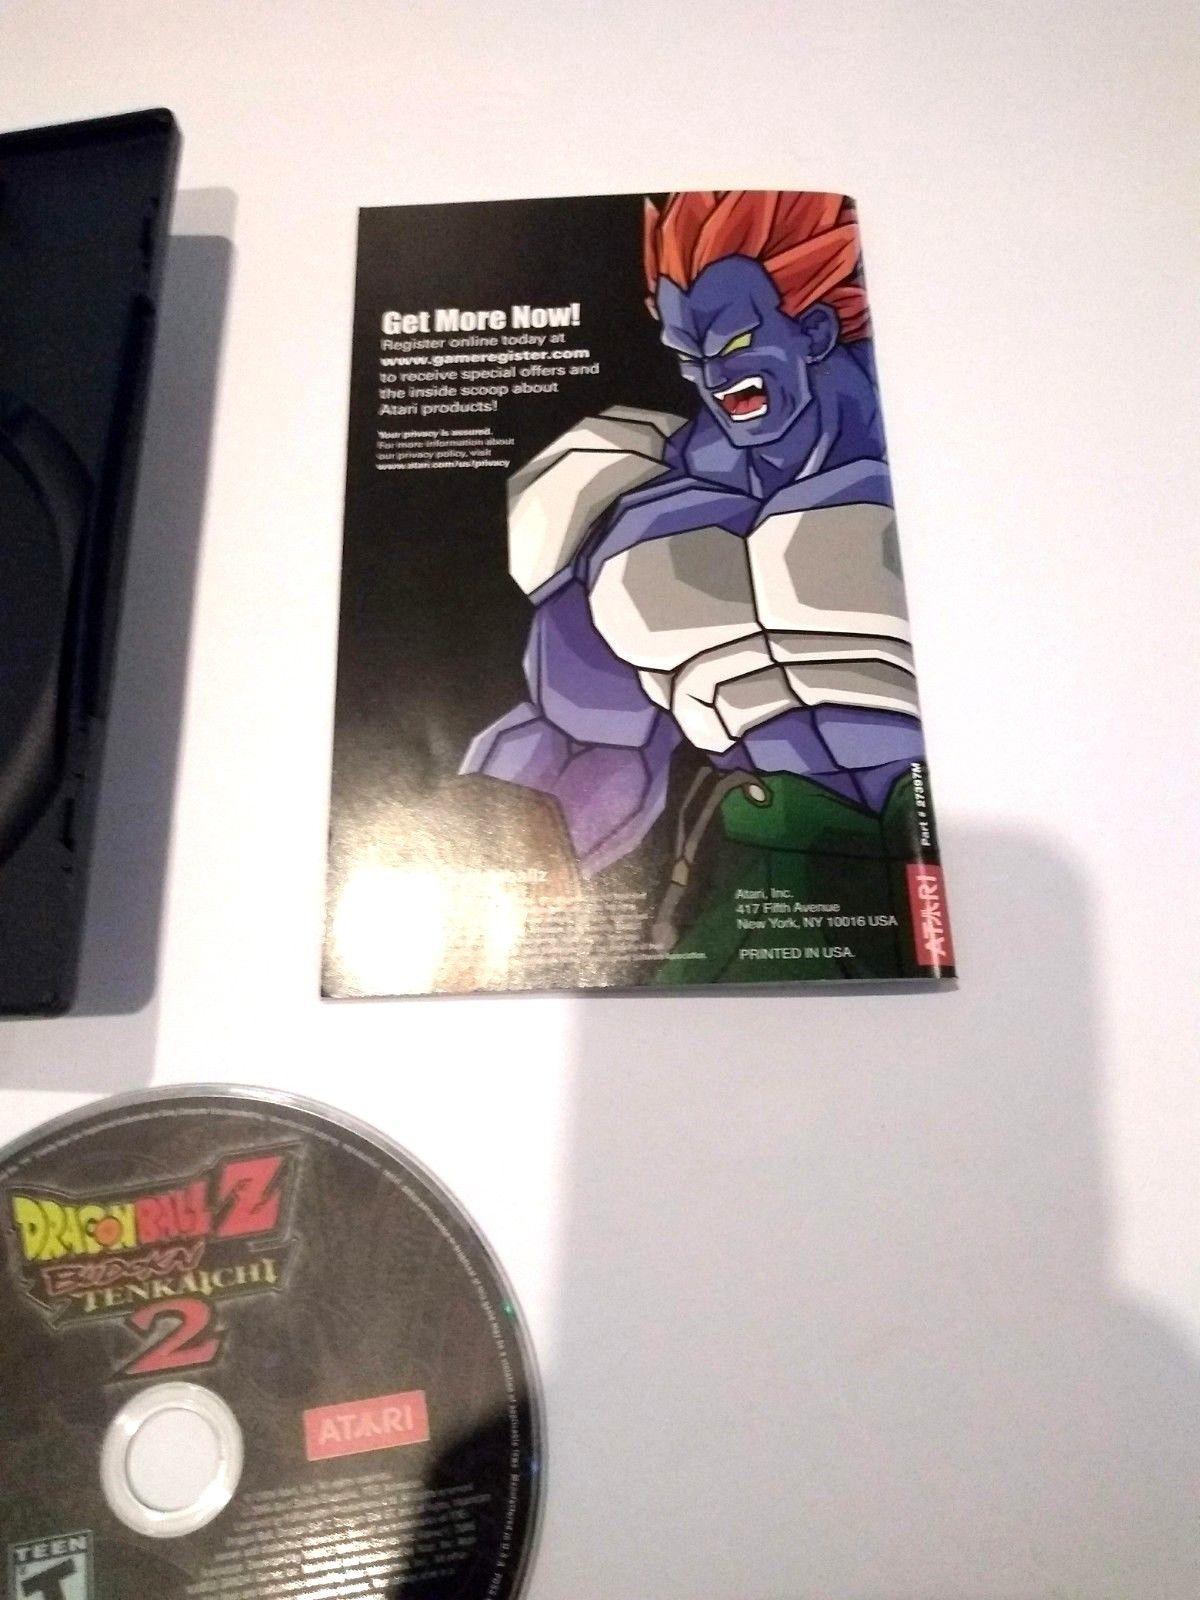 Dragon Ball Z: Budokai Tenkaichi 2 (Sony PlayStation 2, 2006) Rated Teen